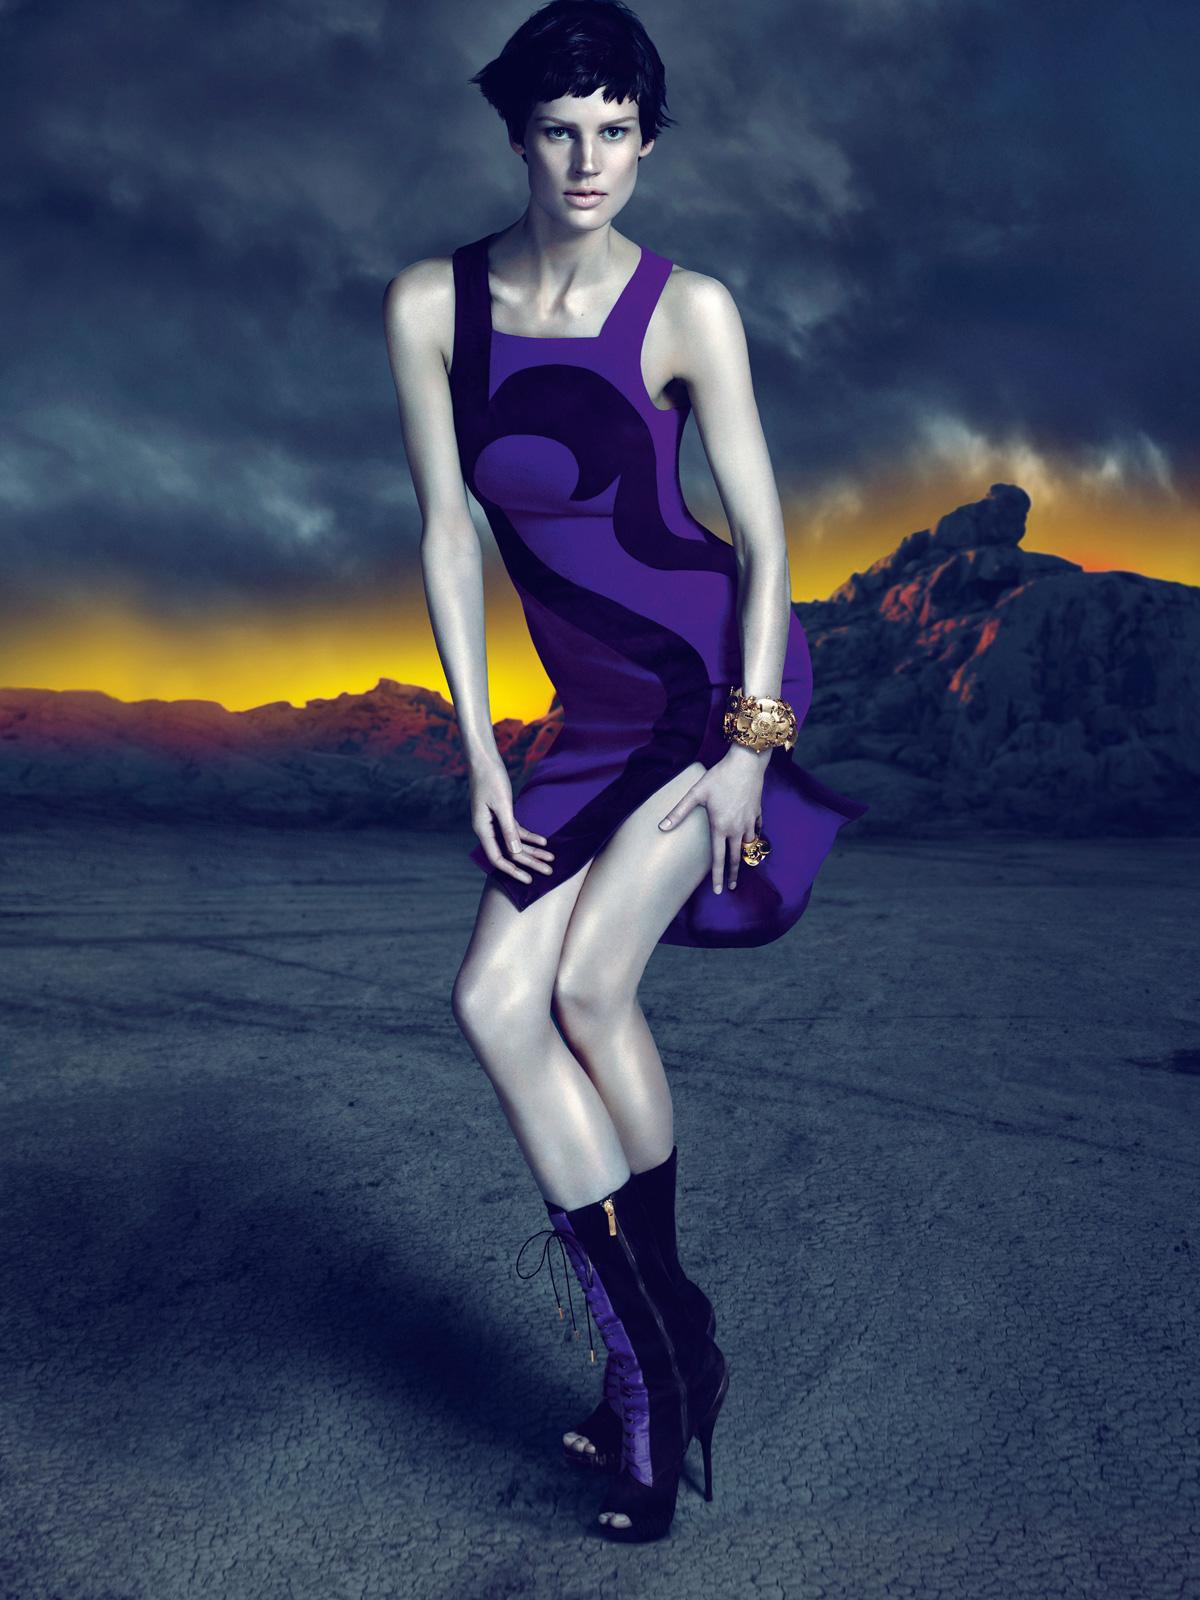 http://3.bp.blogspot.com/-1WUvSemmEws/TkX7UR0IeqI/AAAAAAAAHm0/VuQz1RPDDFM/s1600/Versace+Acessories+%25285%2529.jpg